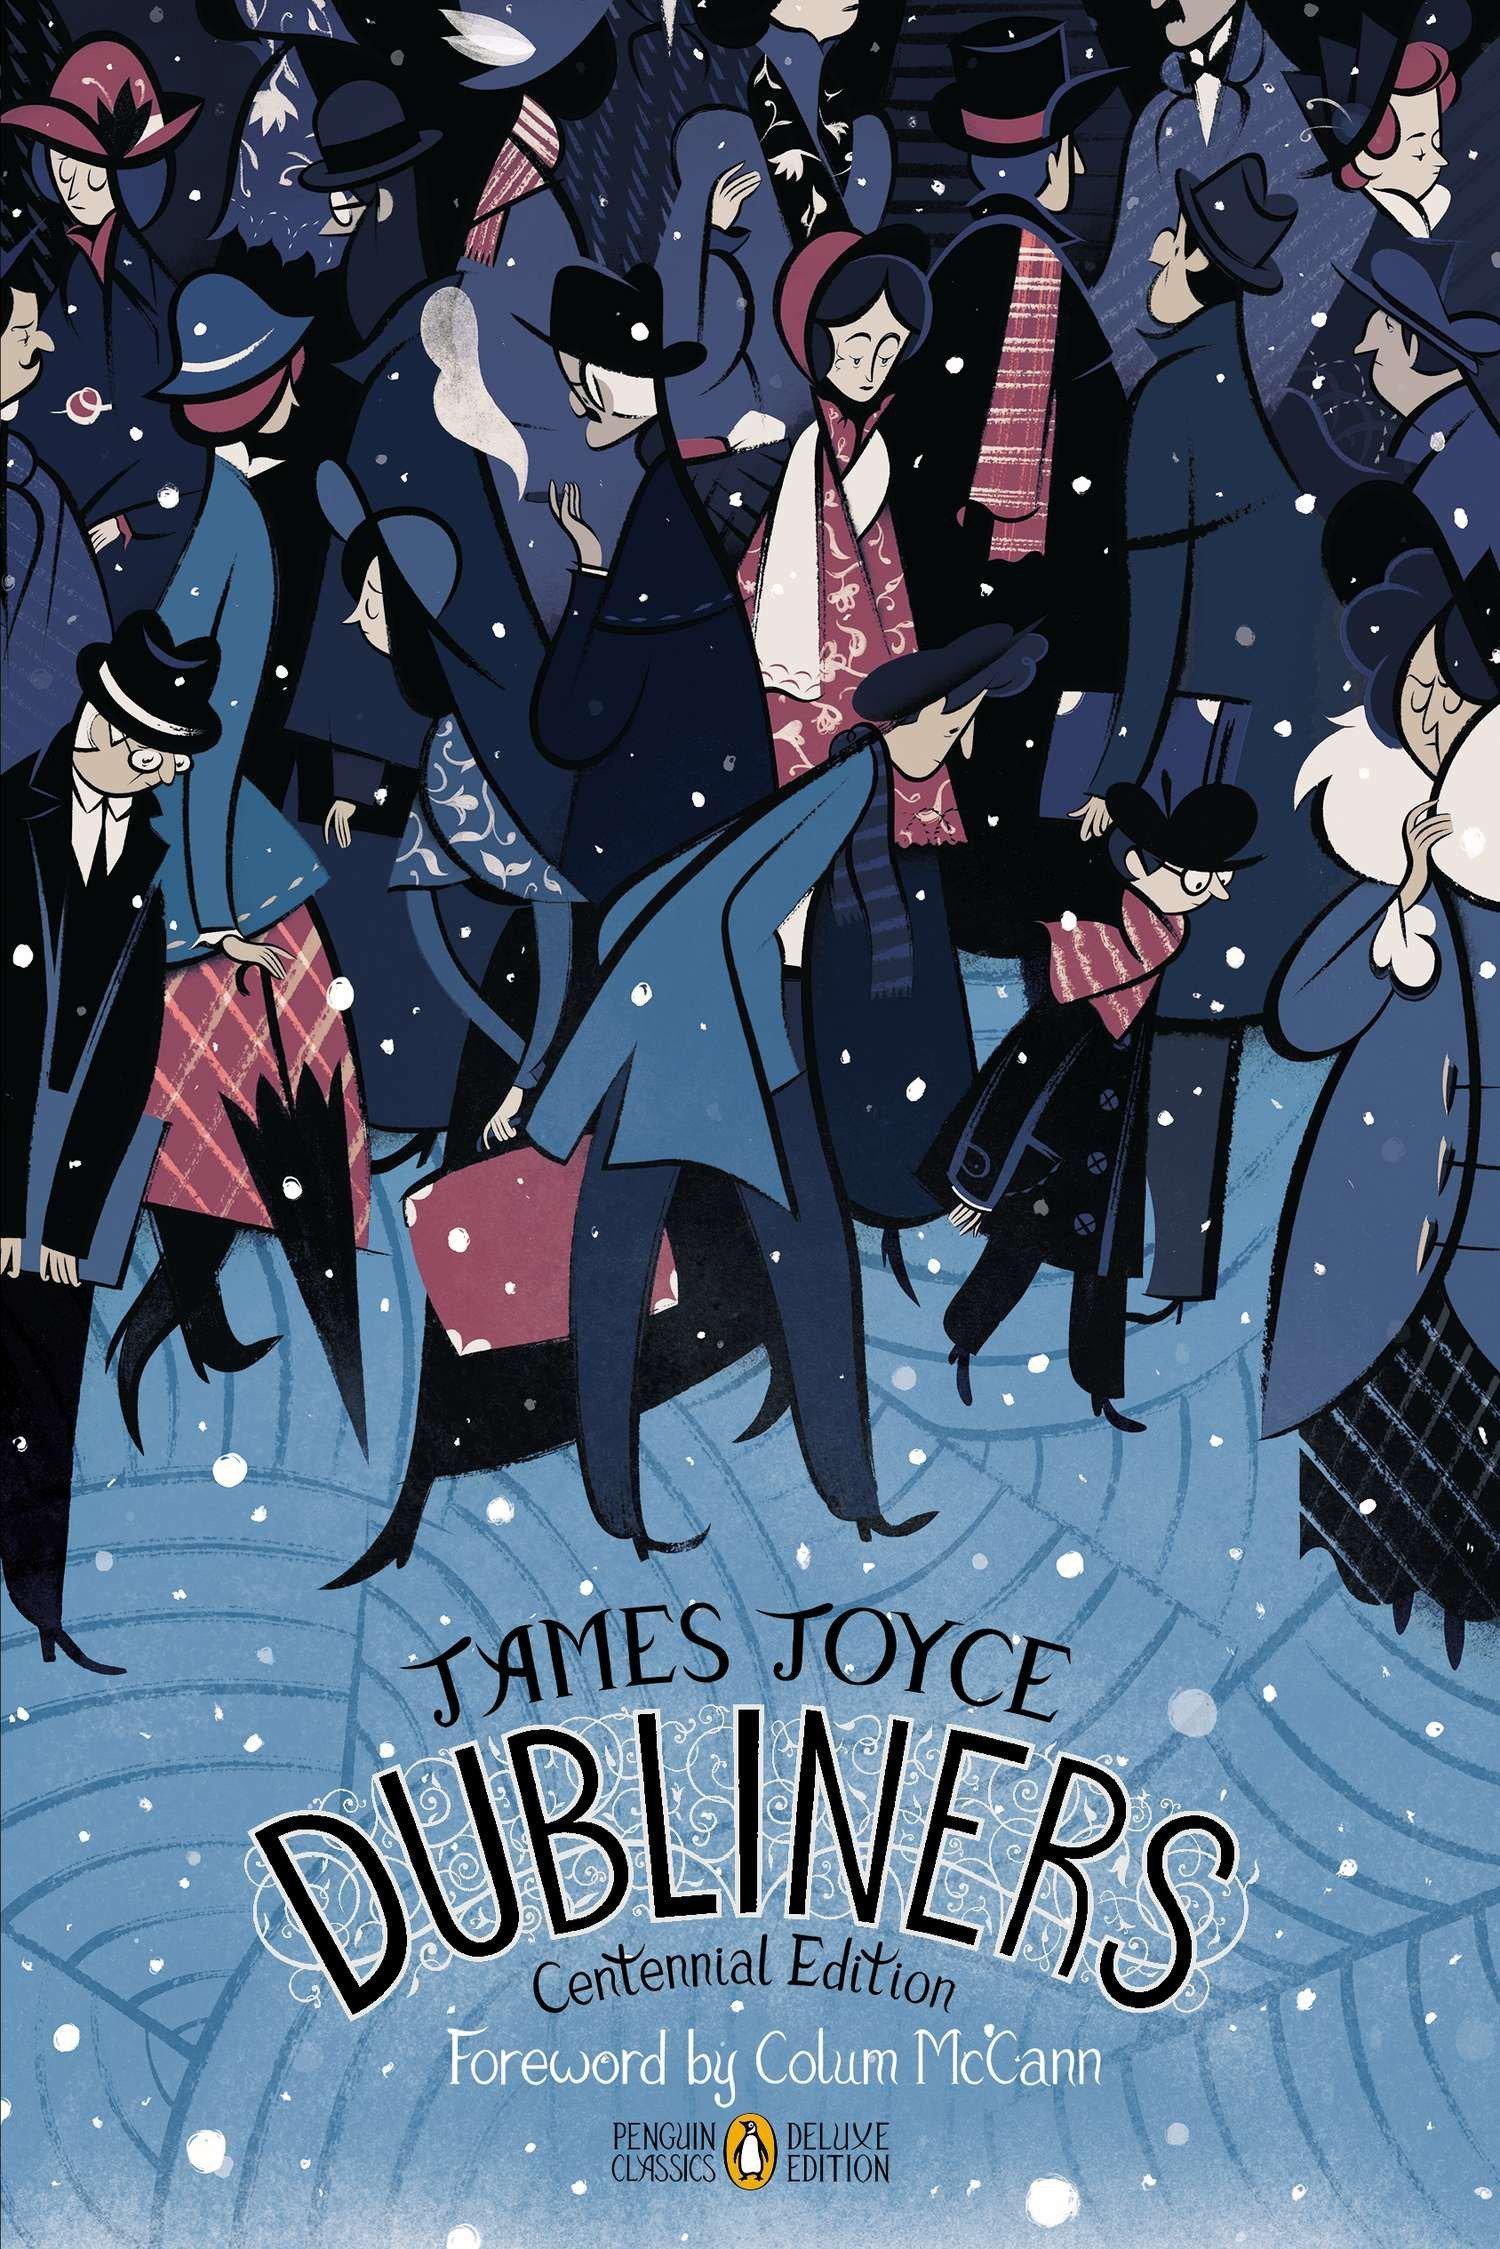 Dubliners: Centennial Edition (Penguin Classics Deluxe Edition) pdf